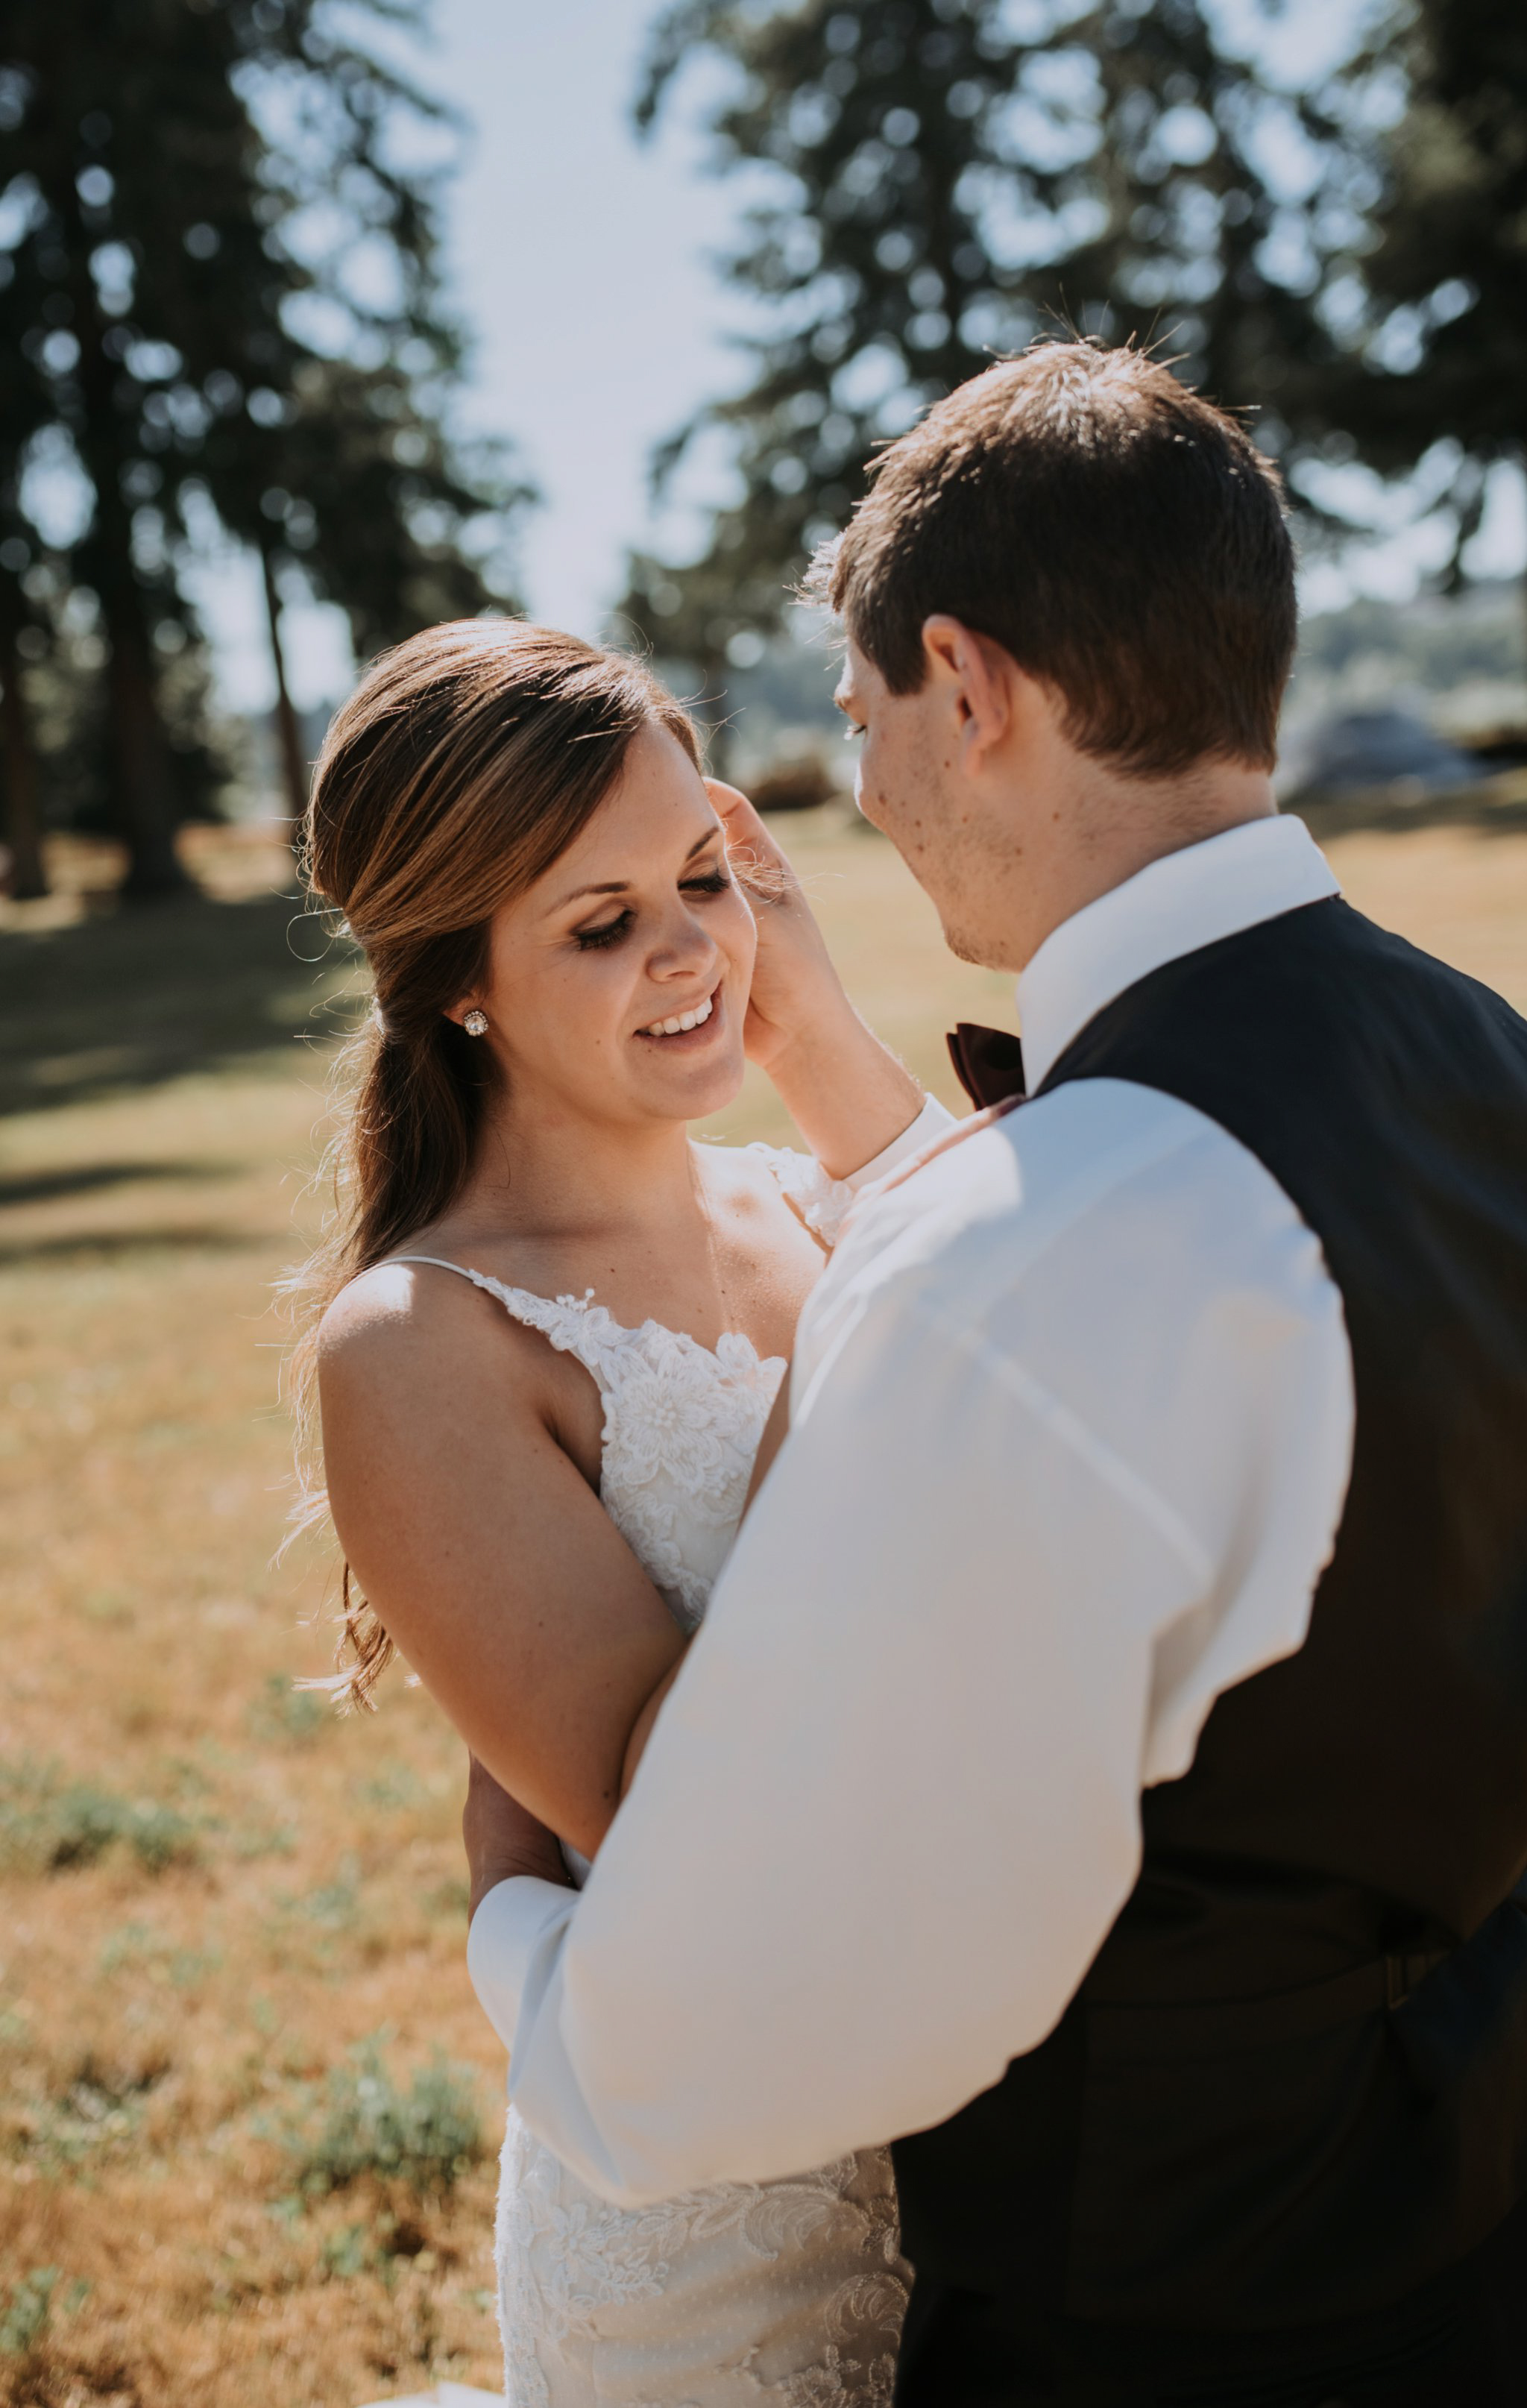 kristen-and-cody-the-kelley-farm-wedding-seattle-photographer-caitlyn-nikula-48.jpg